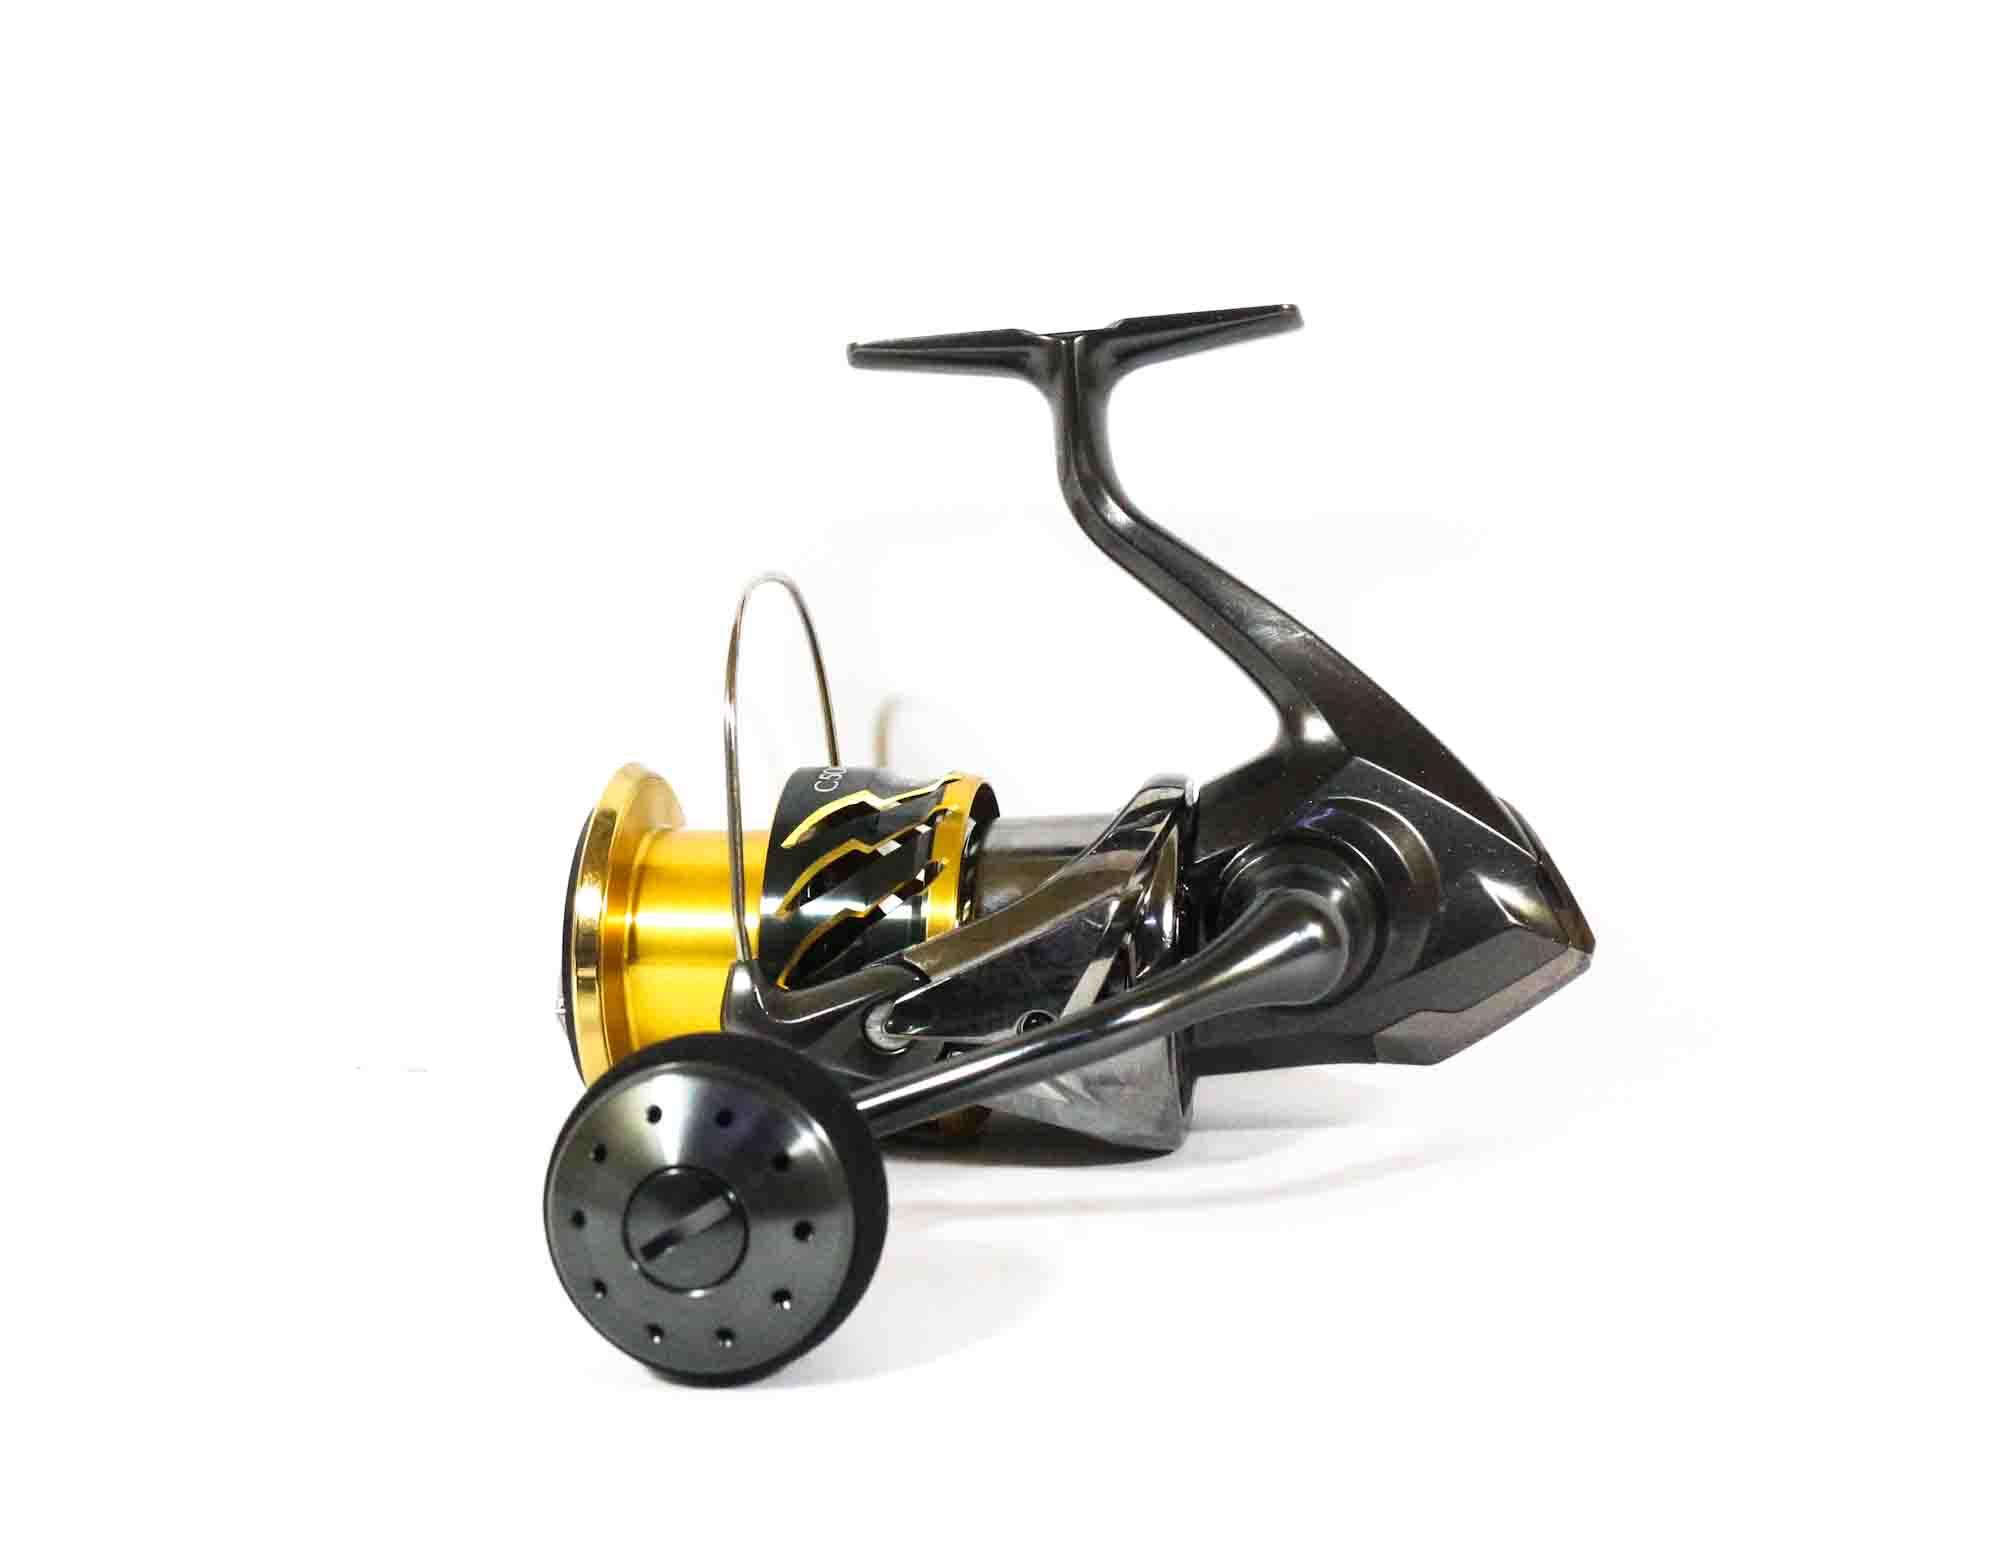 Shimano Reel Spinning Twinpower FD C5000 XG 2020 (2330)